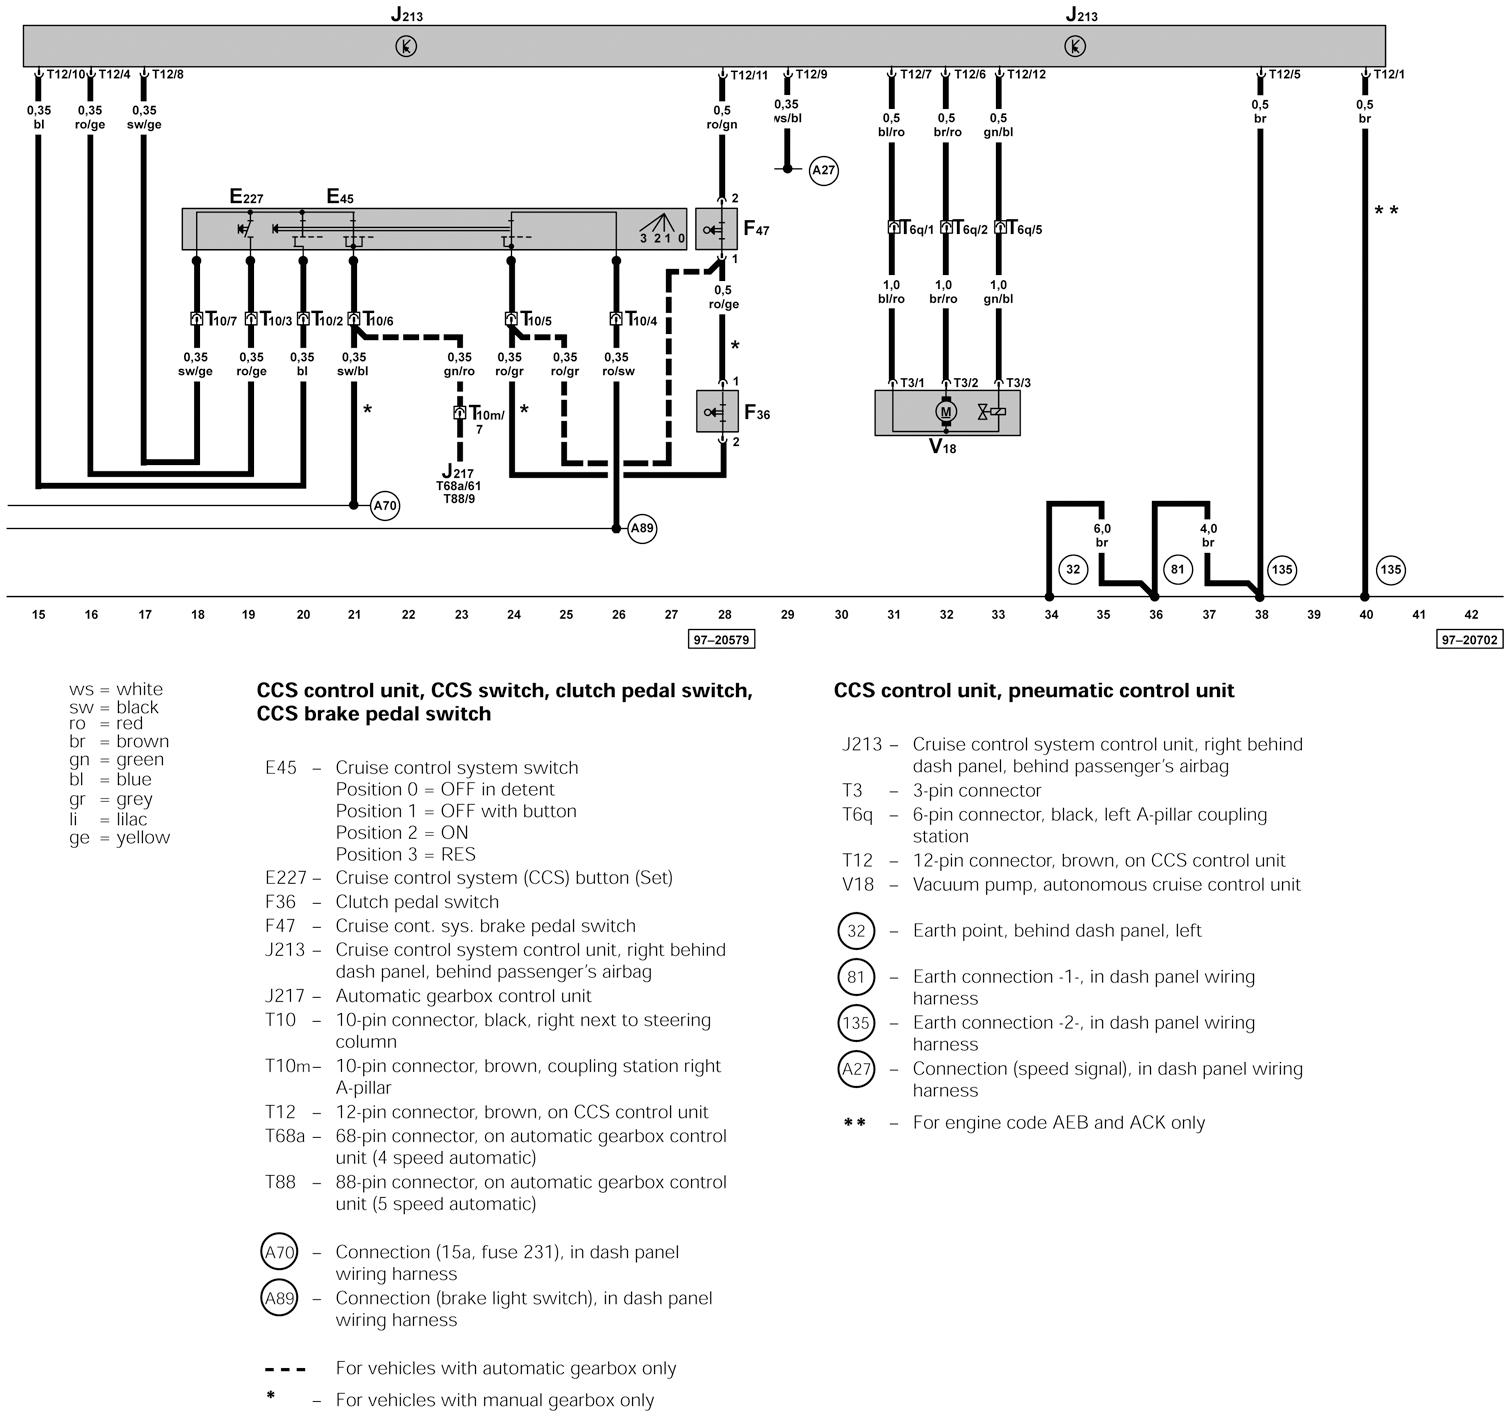 1999 toyota corolla wiring diagram pdf